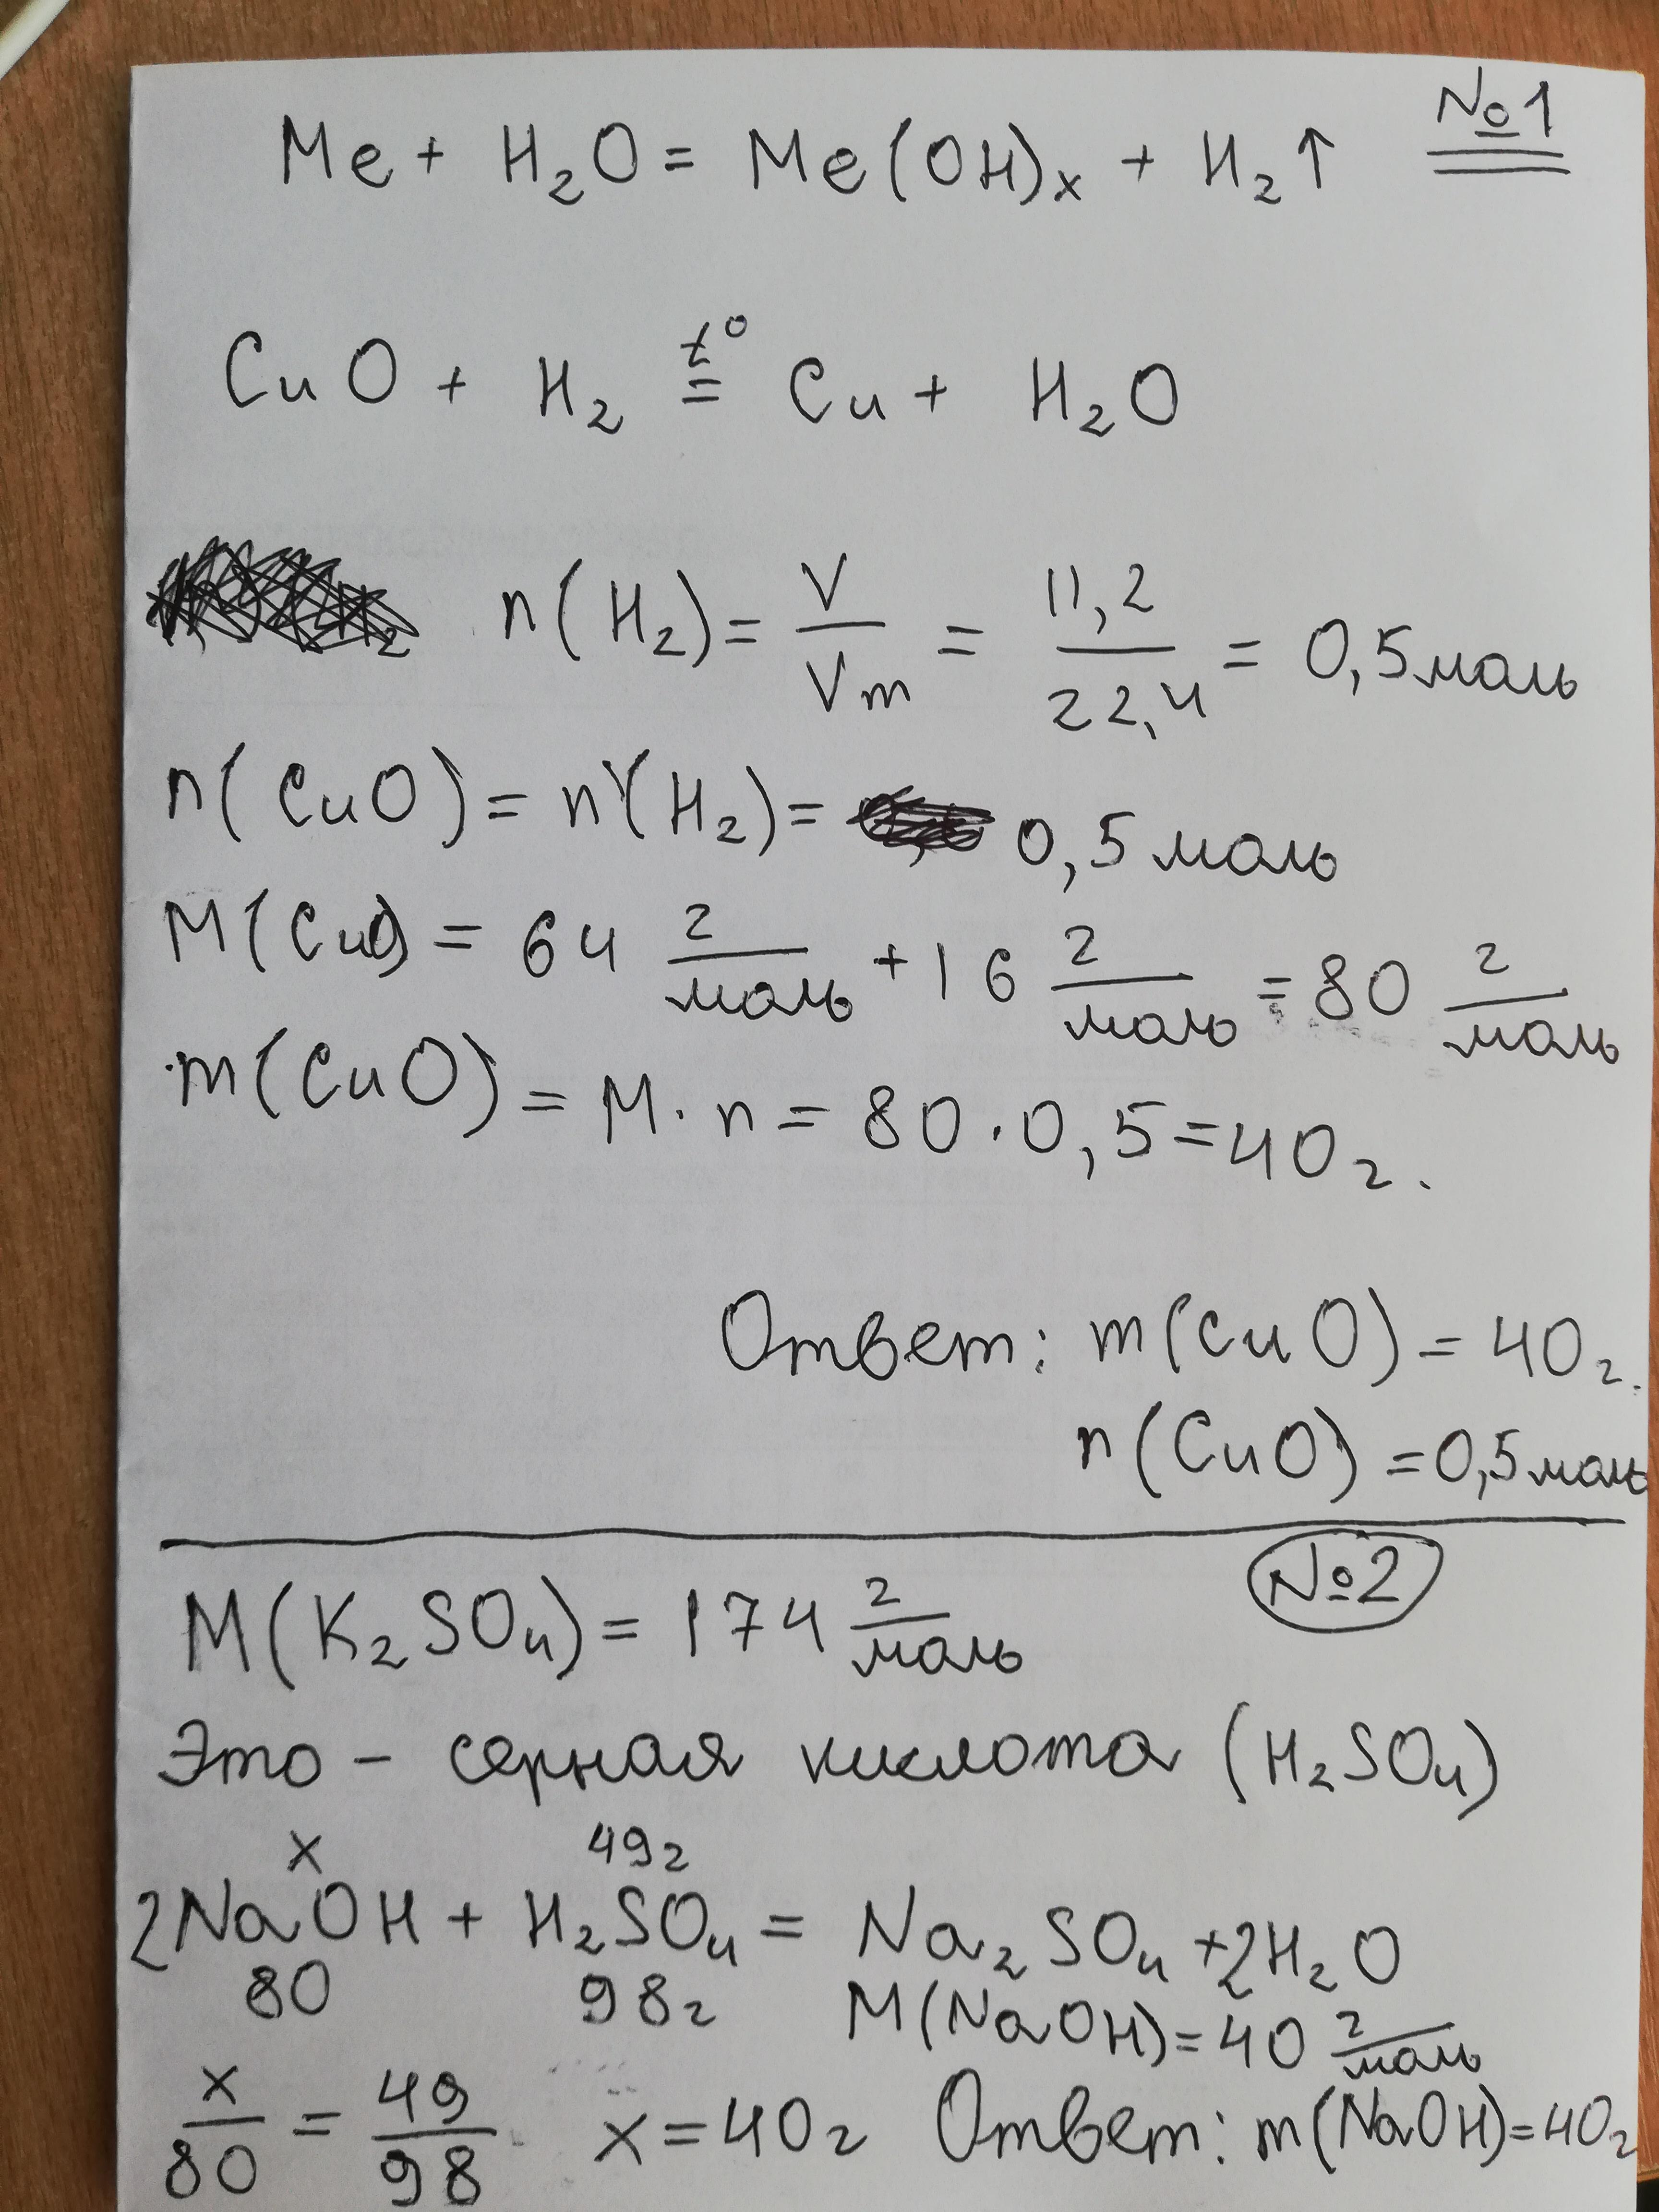 Помогите решить 2 задачи по химии, с дано и